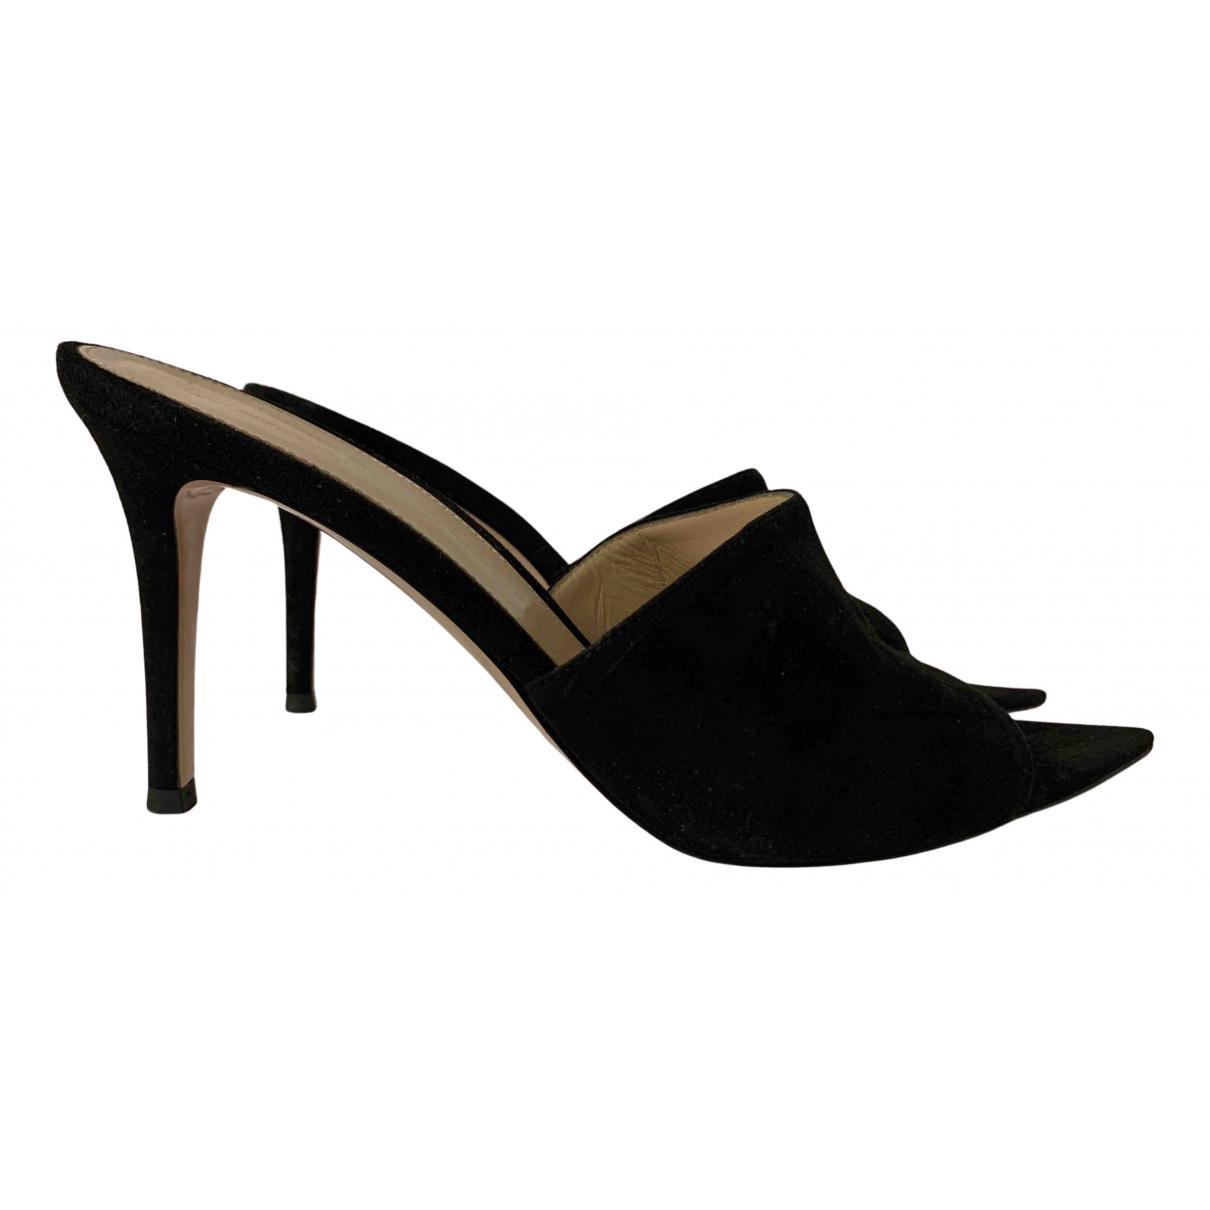 Gianvito Rossi N Black Suede Sandals for Women 38.5 EU